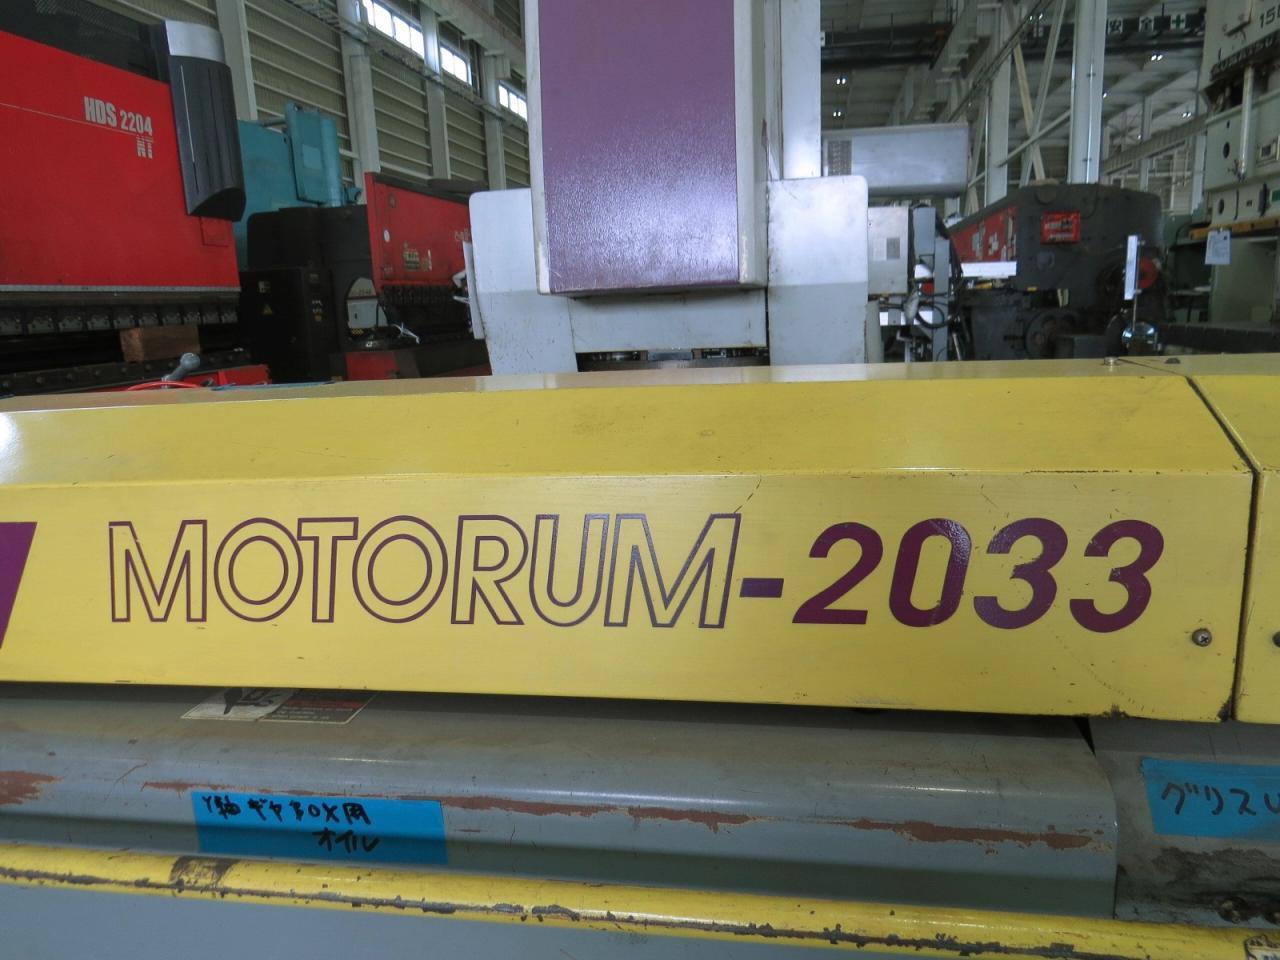 MOTORUM-2033の型式表示部